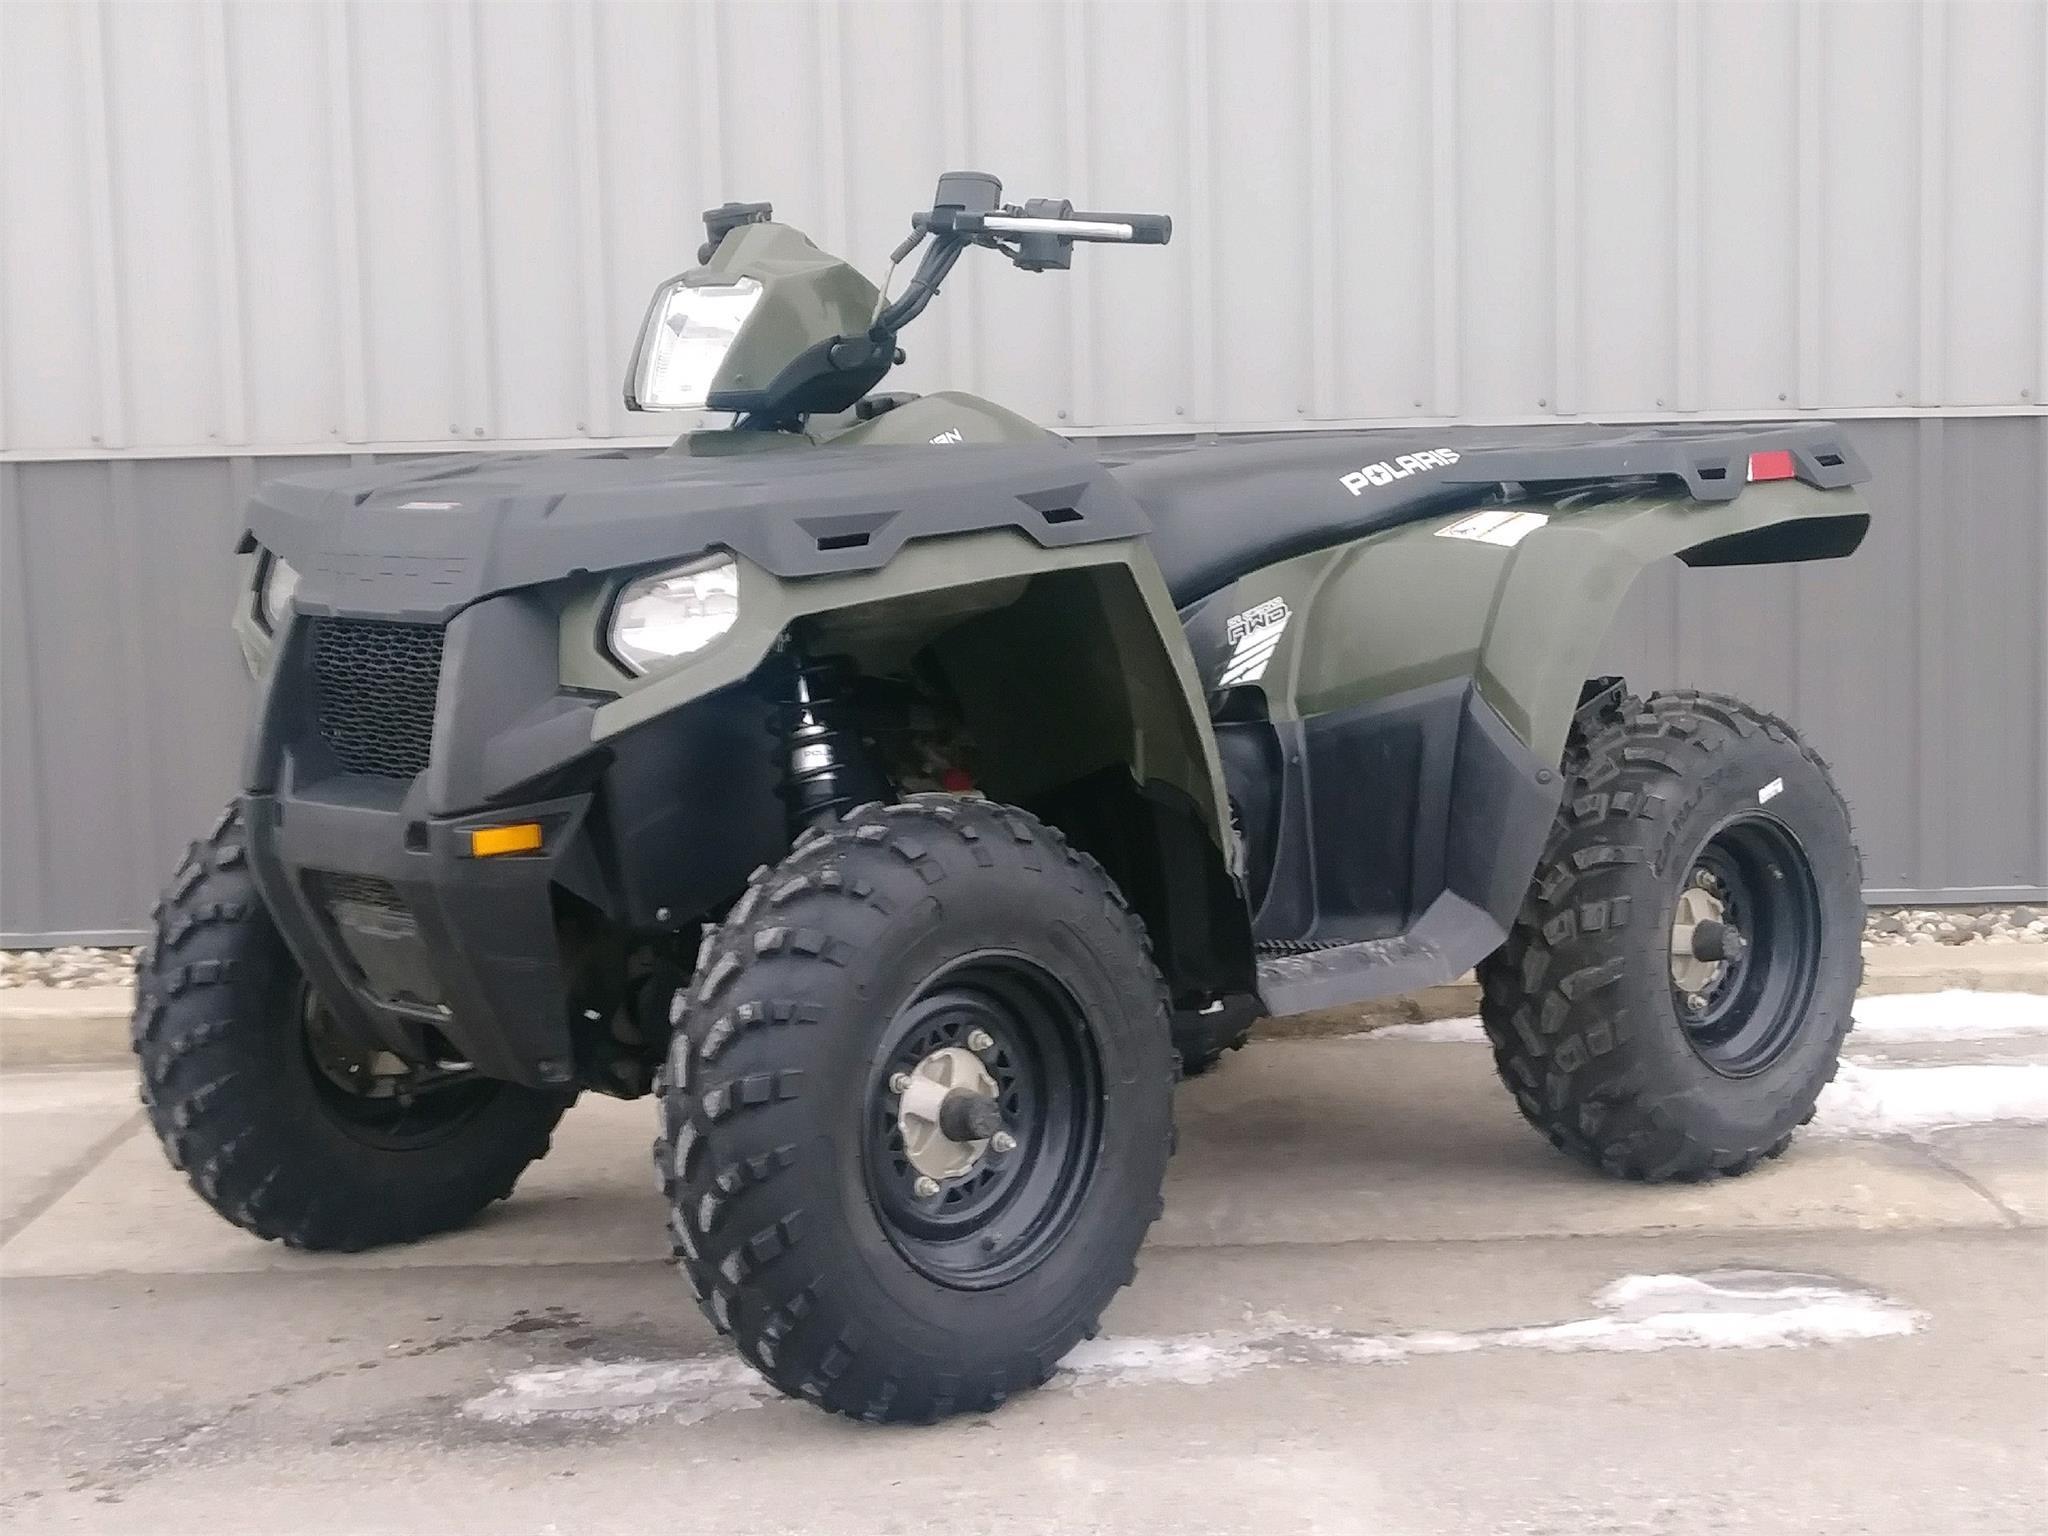 2013 POLARIS SPORTSMAN 500 HO For Sale in Atlantic, Iowa